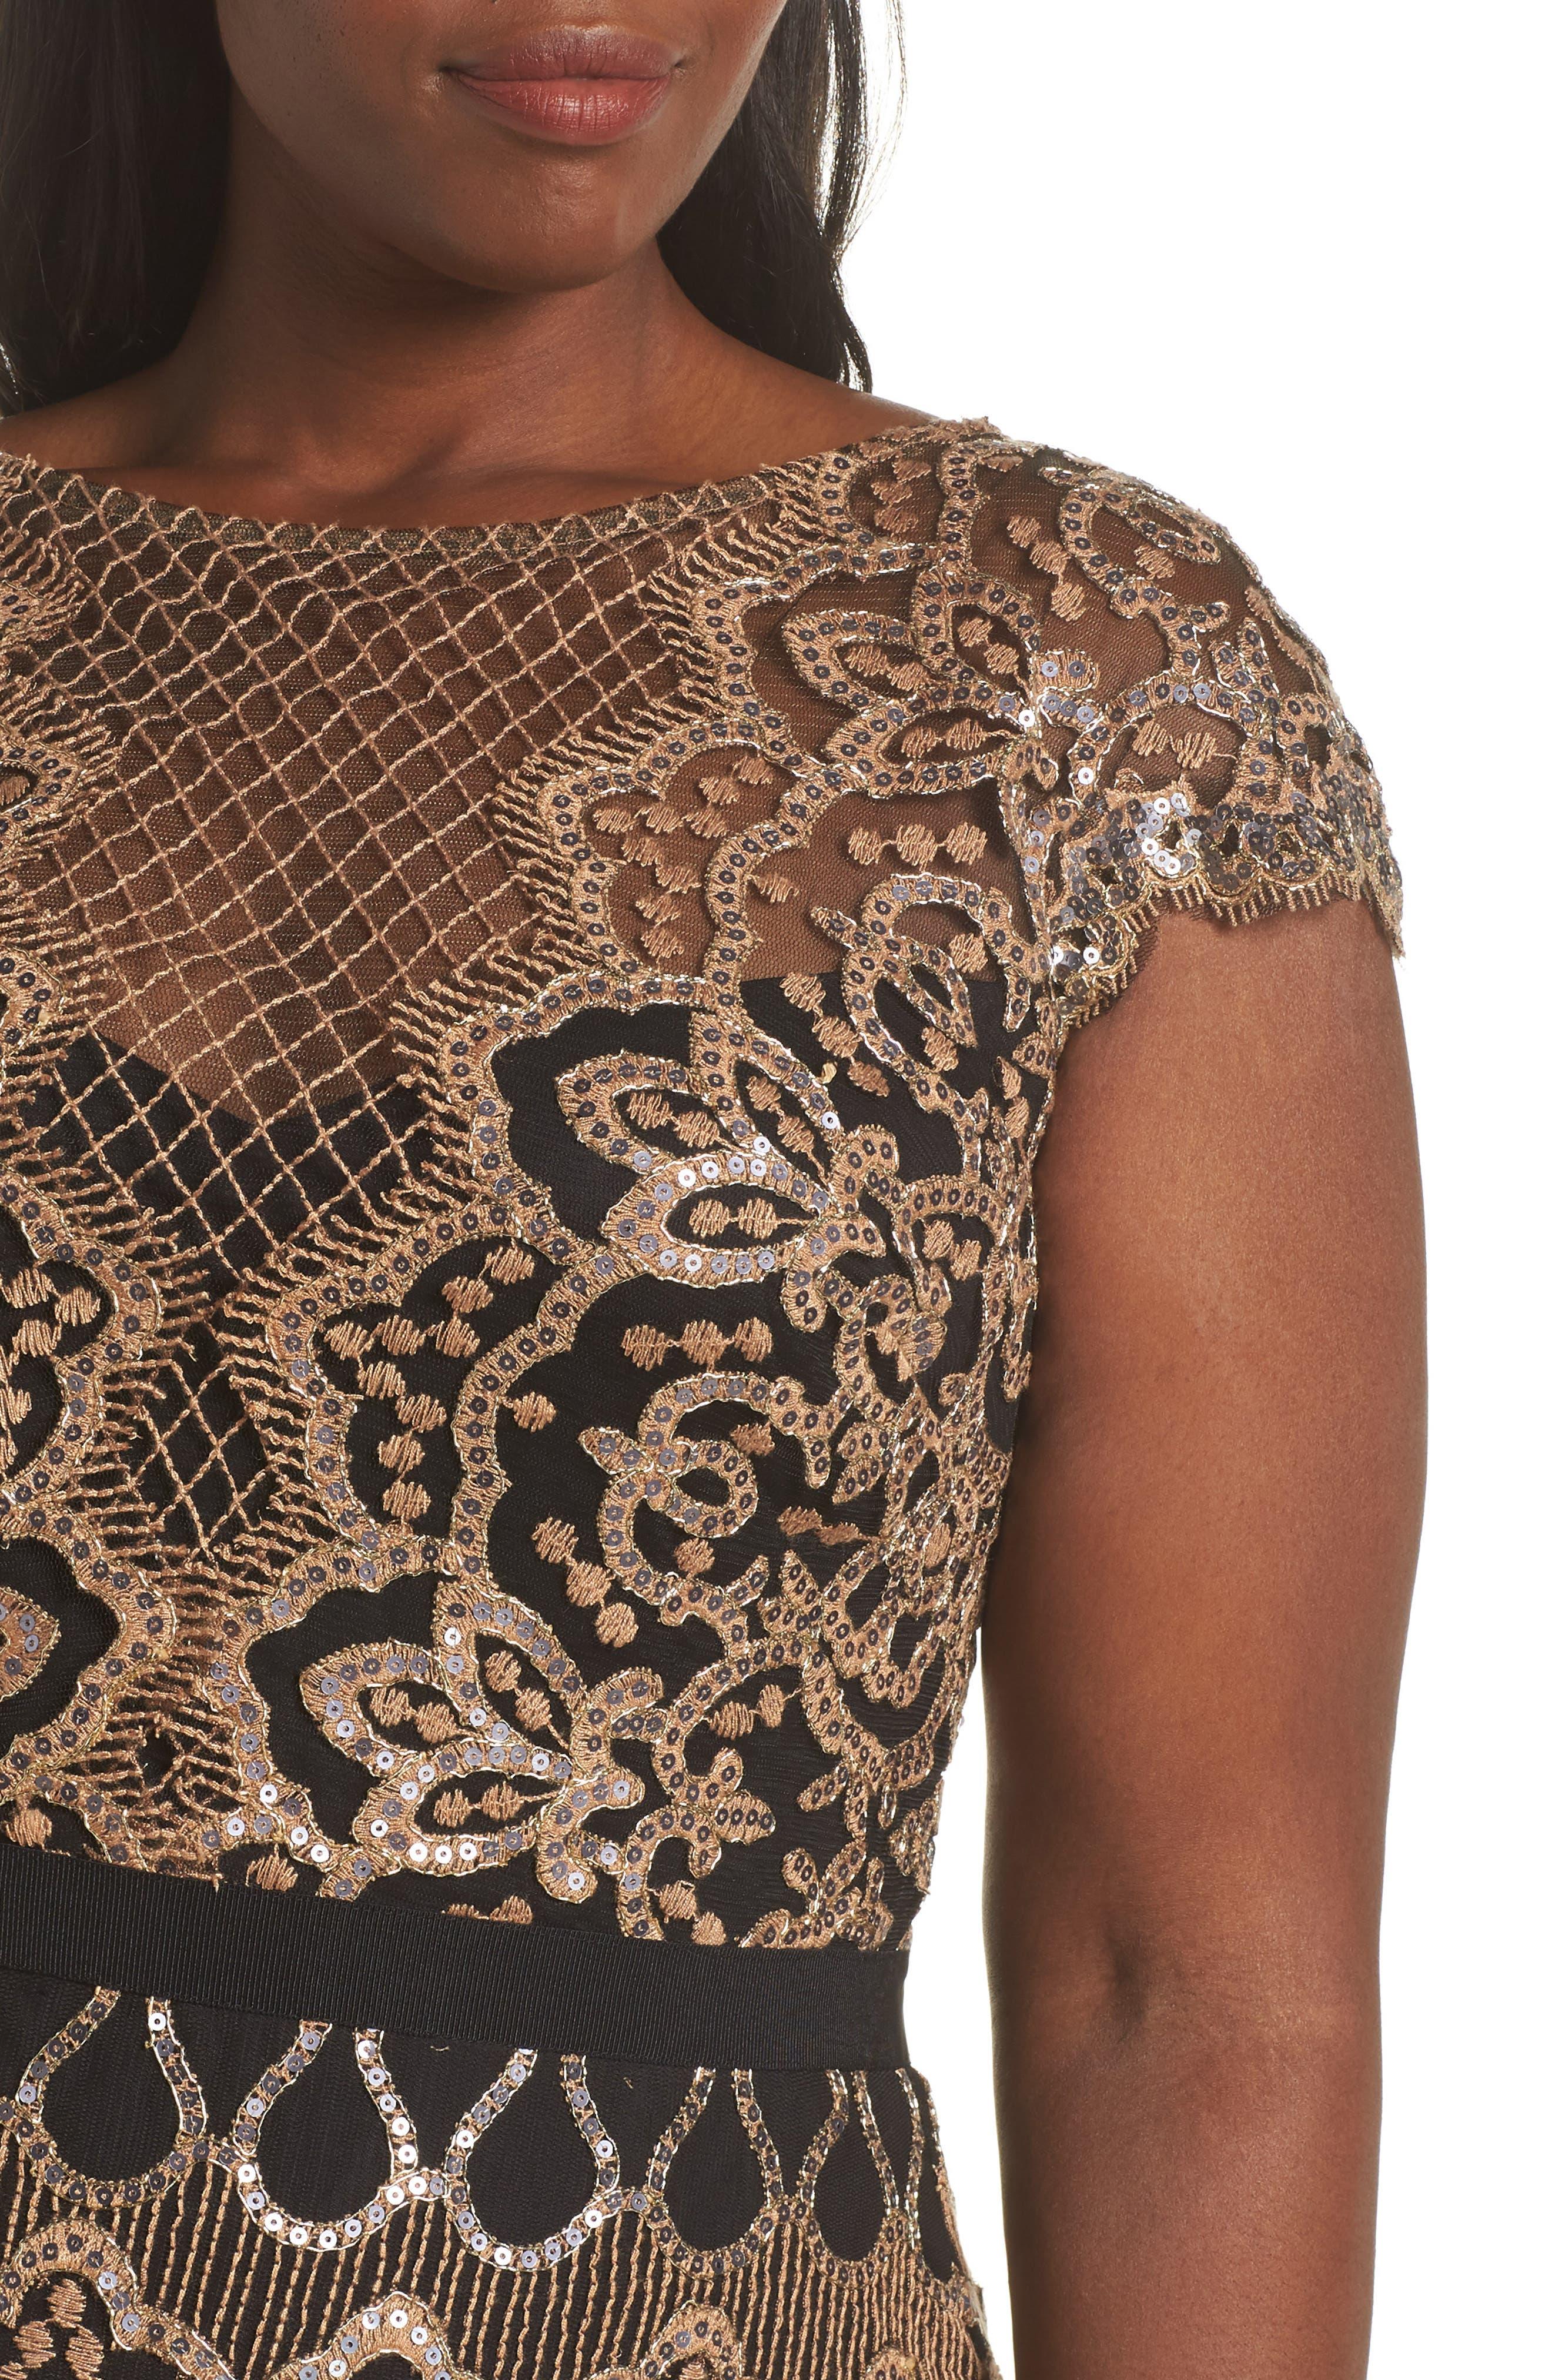 Sequin Embellished Dress,                             Alternate thumbnail 11, color,                             COPPER SHADOW/ BLACK